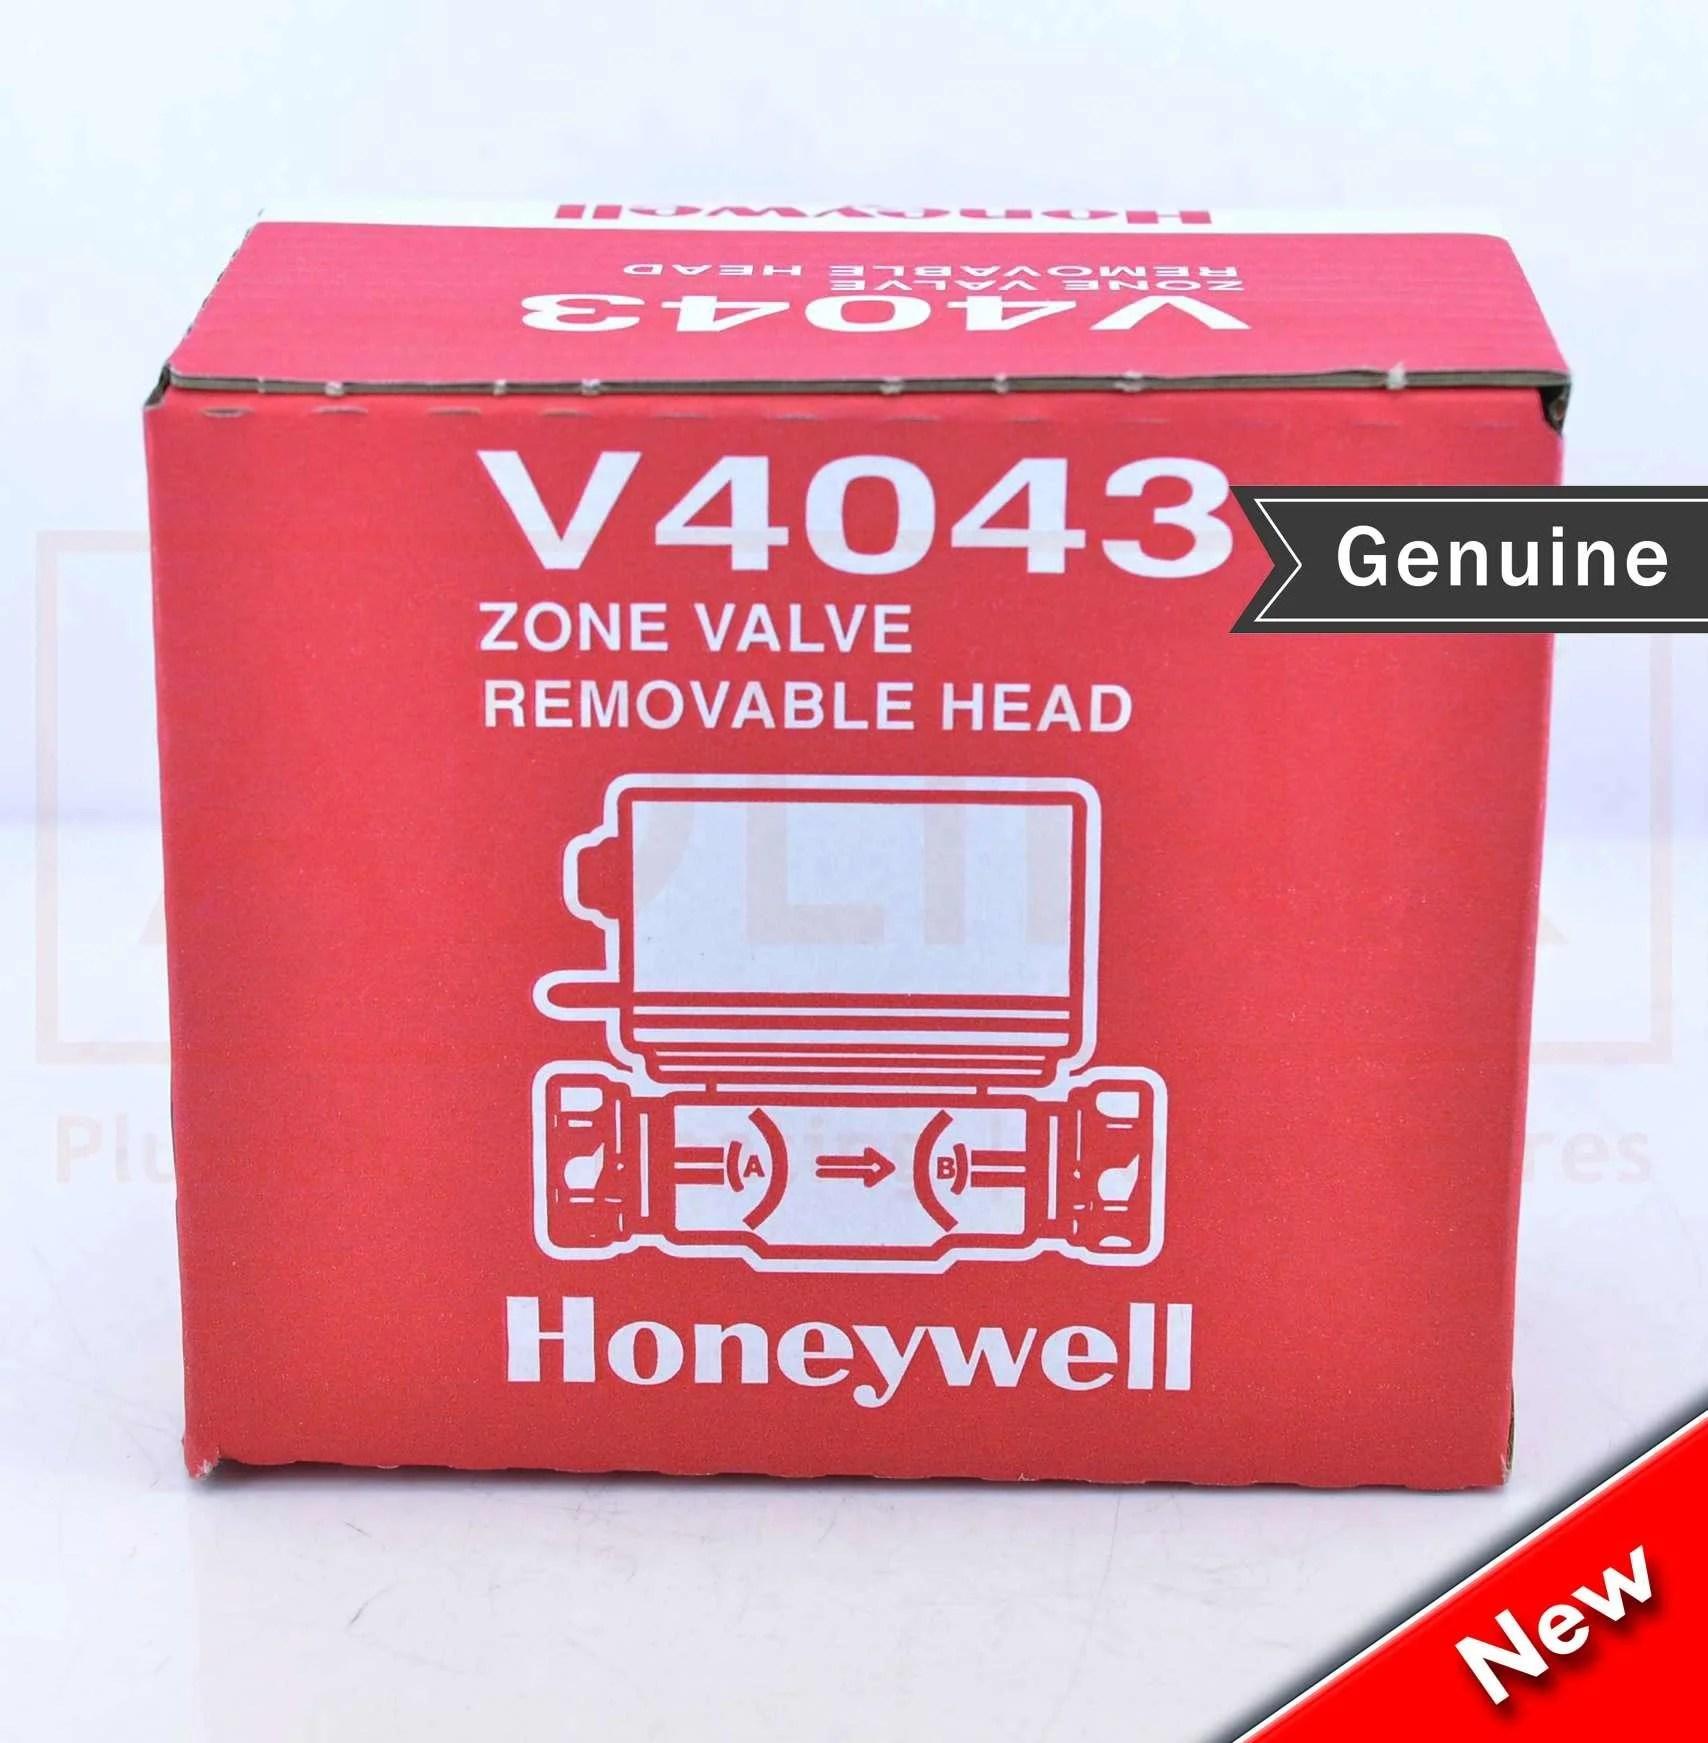 Valve Wiring Honeywell 3 Port Zone Valve Wiring Diagram Zone Valve